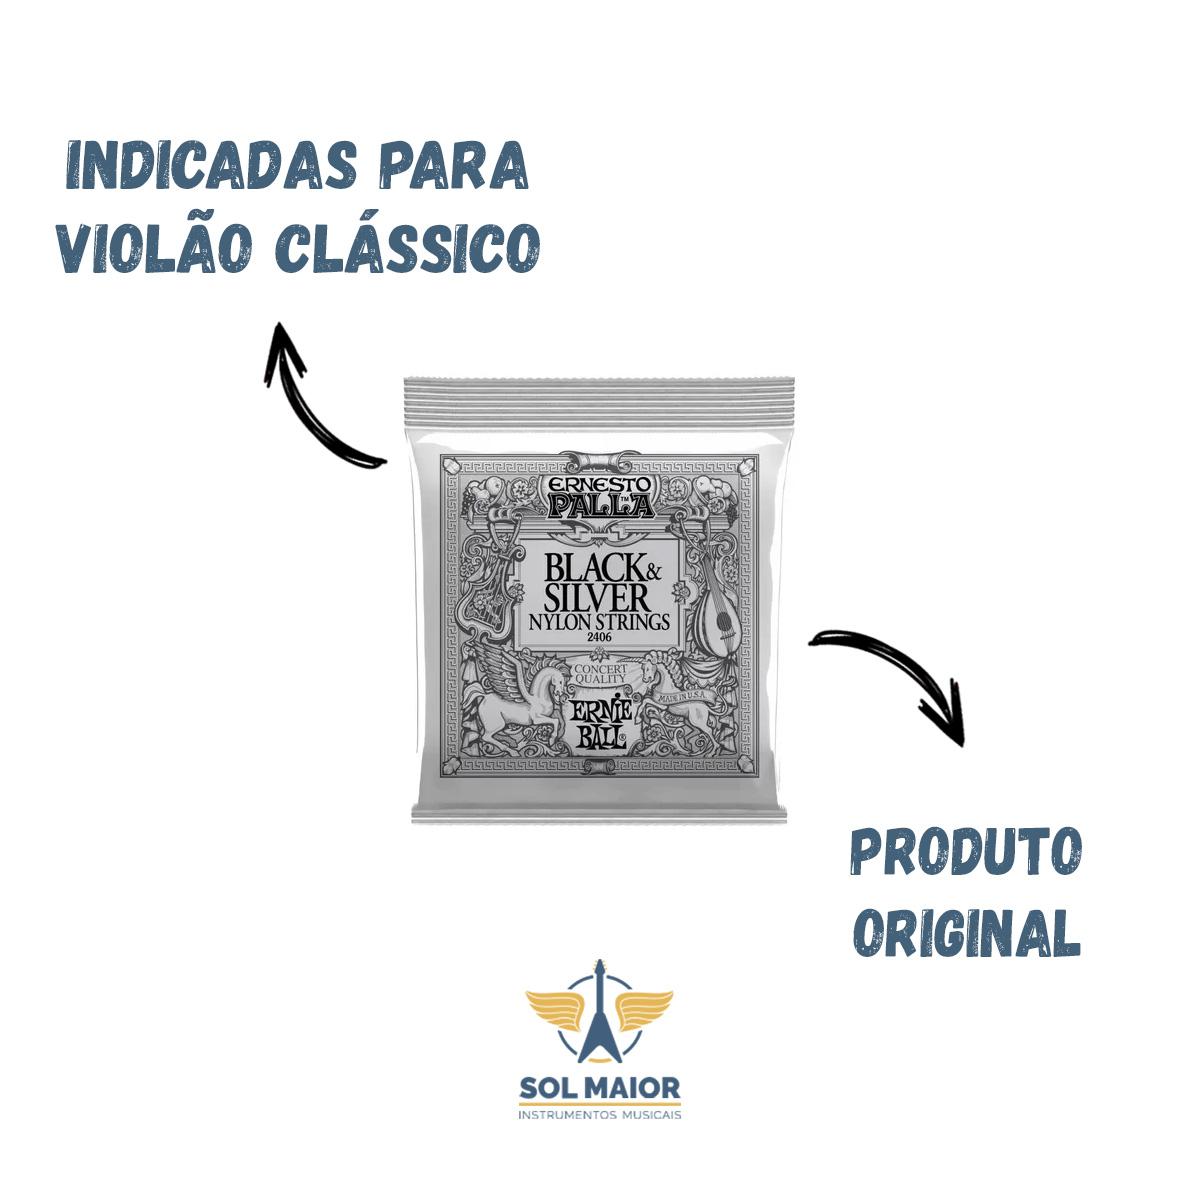 Kit com 2 Cordas de Violão Nylon Ernie Ball Ernesto Palla Black Silver